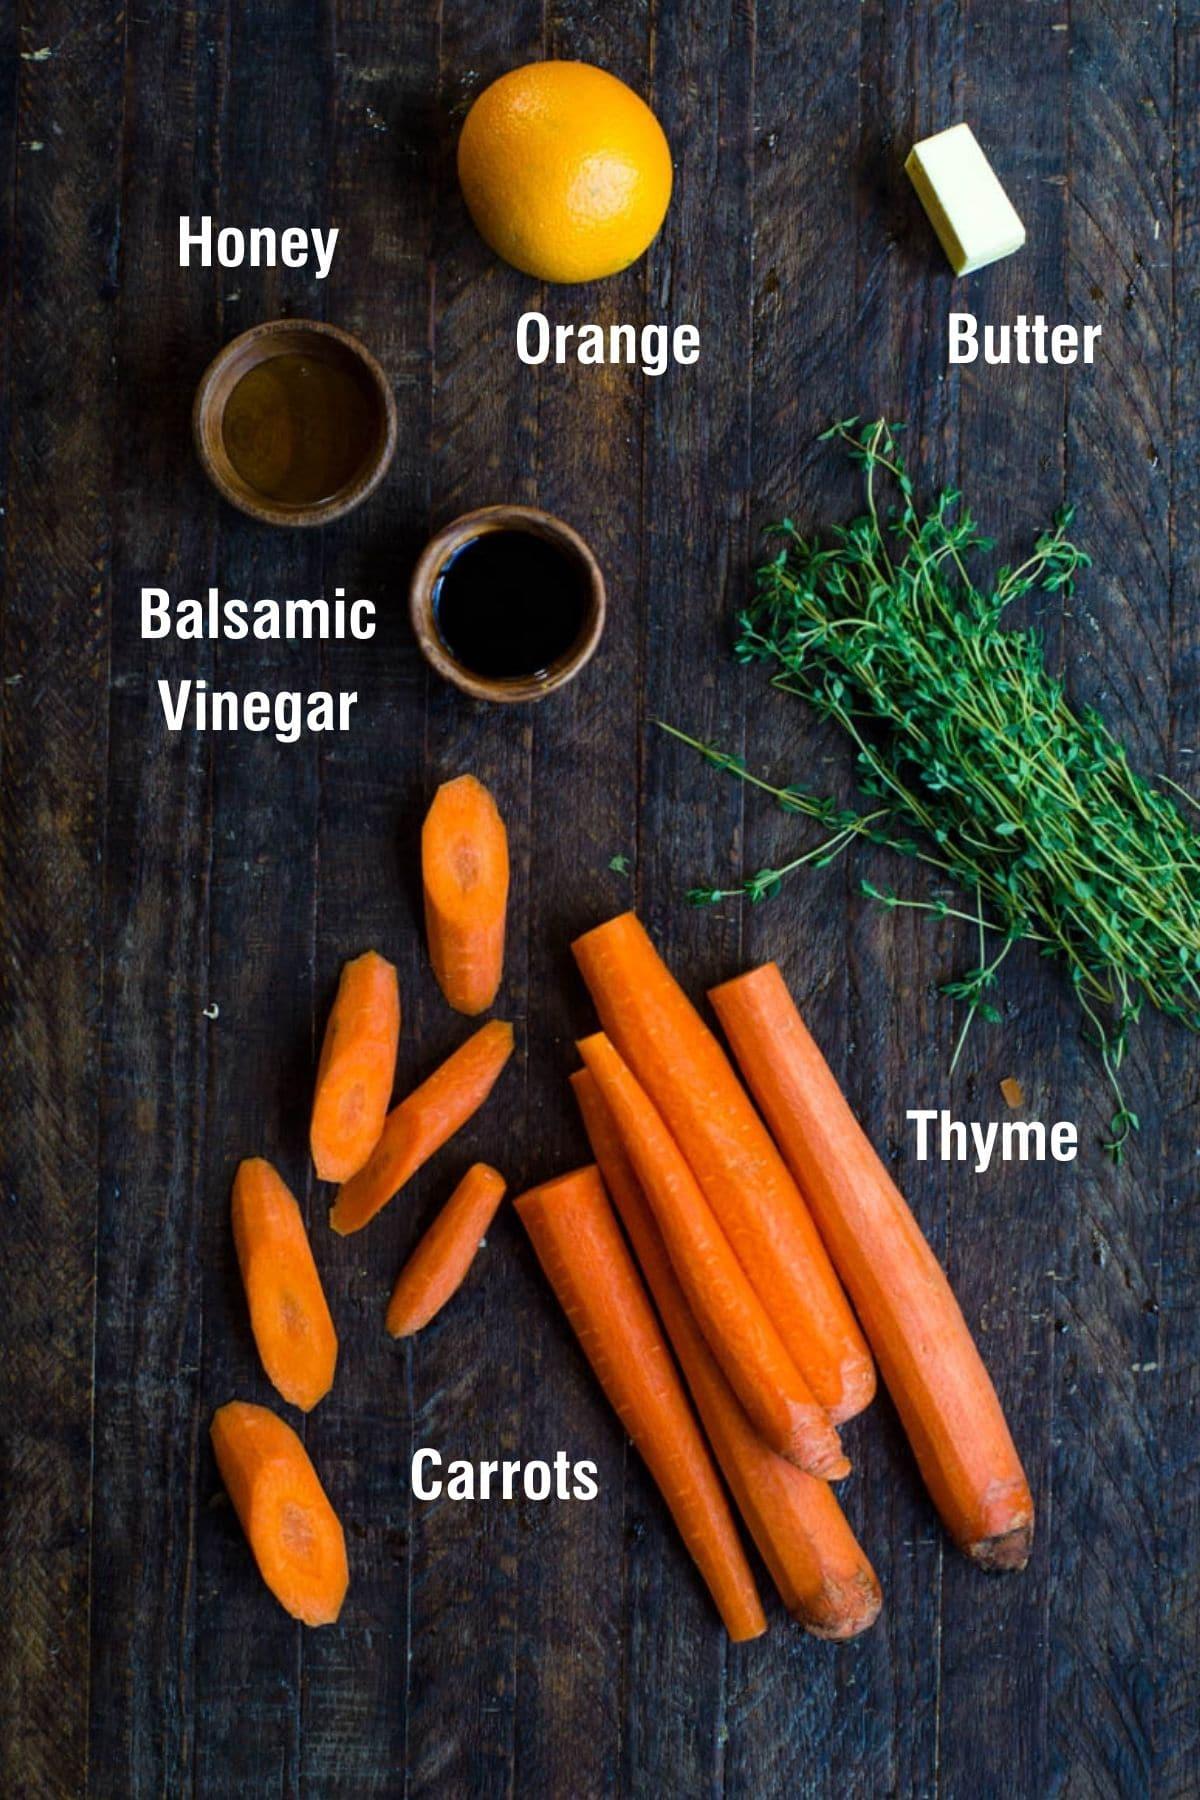 Labeled ingredients for making honey balsamic glazed carrots.